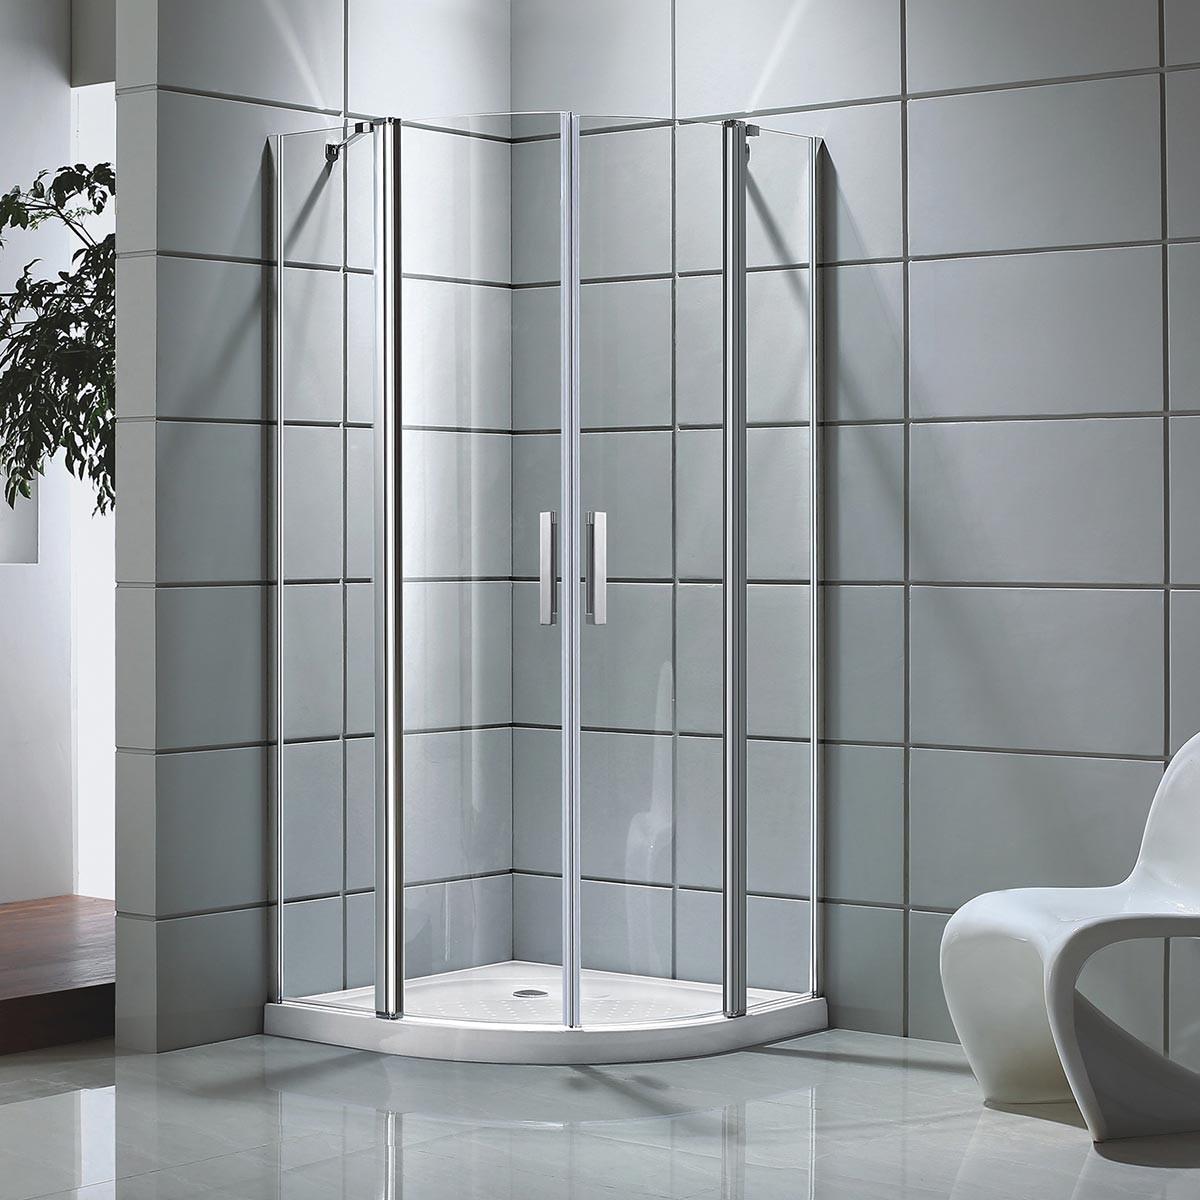 39 x 39 x 75 In. Shower Enclosure (DK-D501-100) | Decoraport Canada